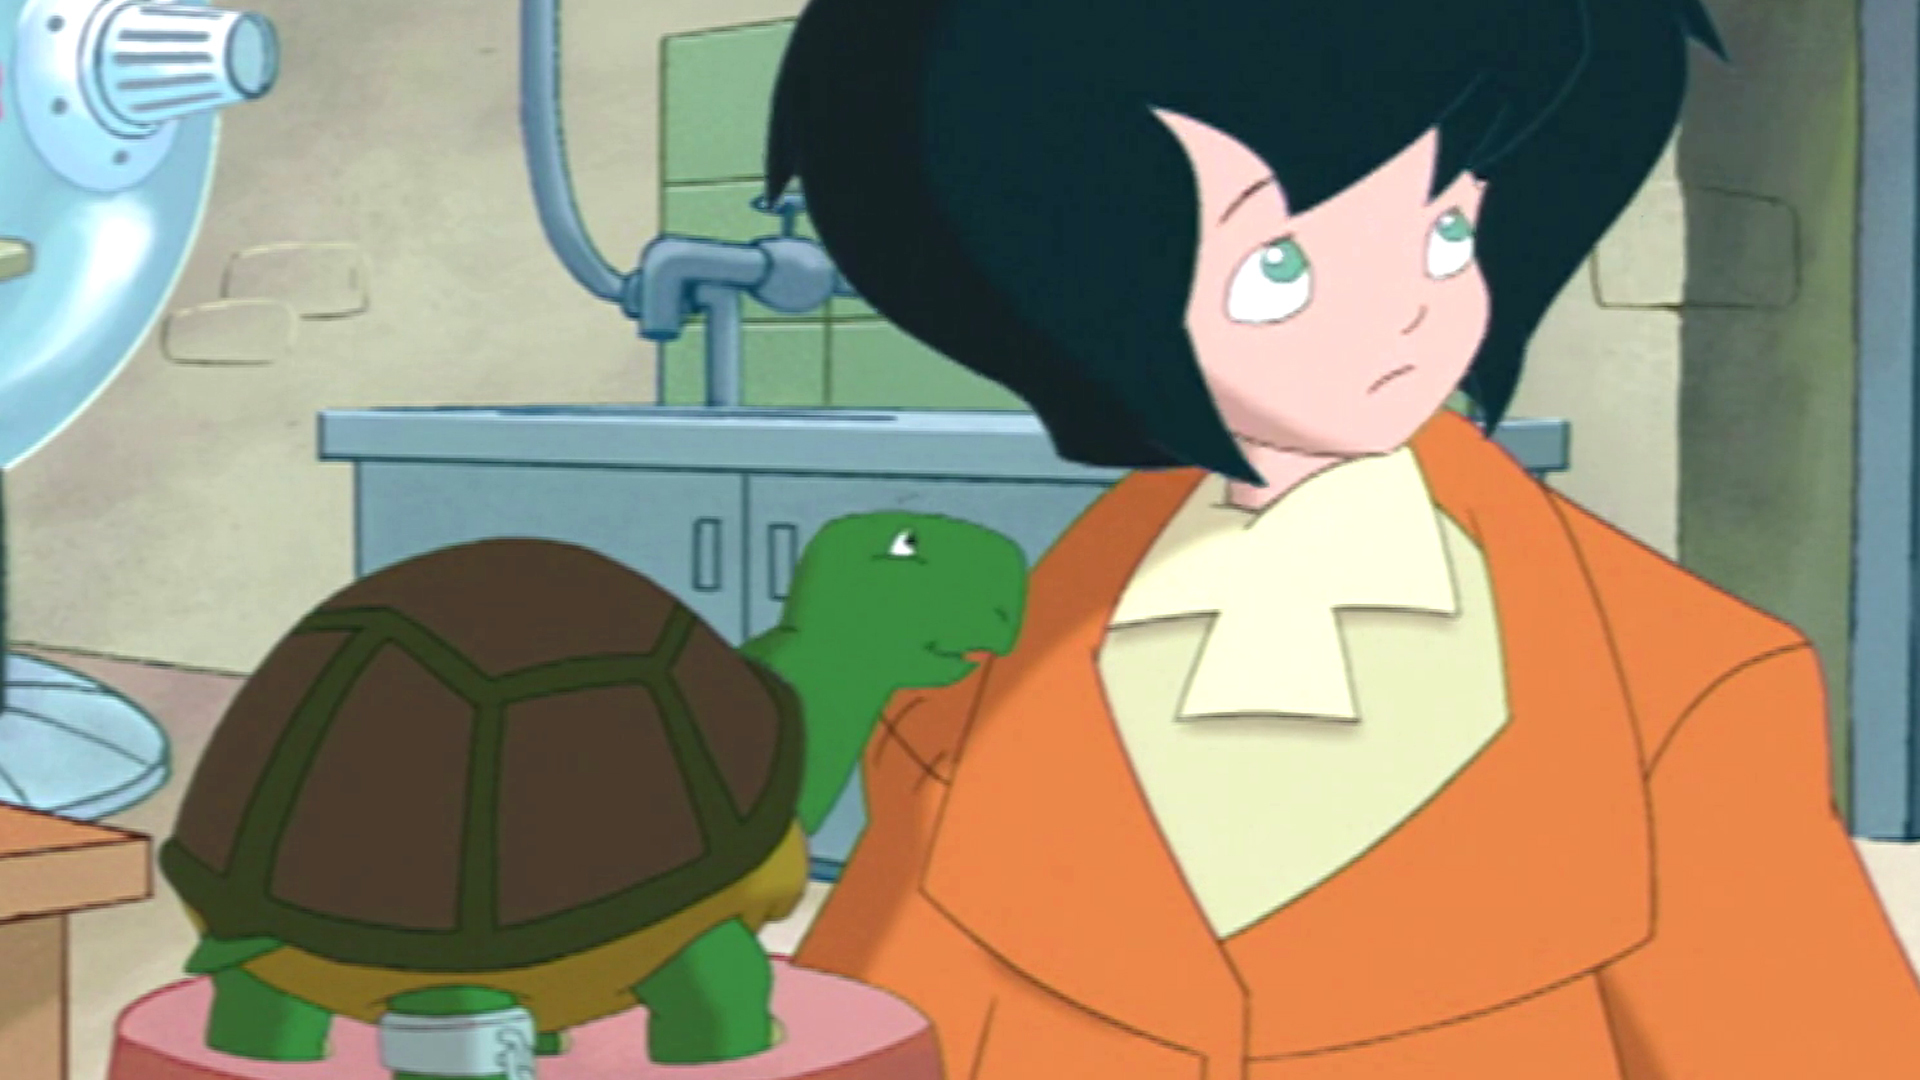 Temporada 1 Capítulo 20: Momo busca a Casiopea